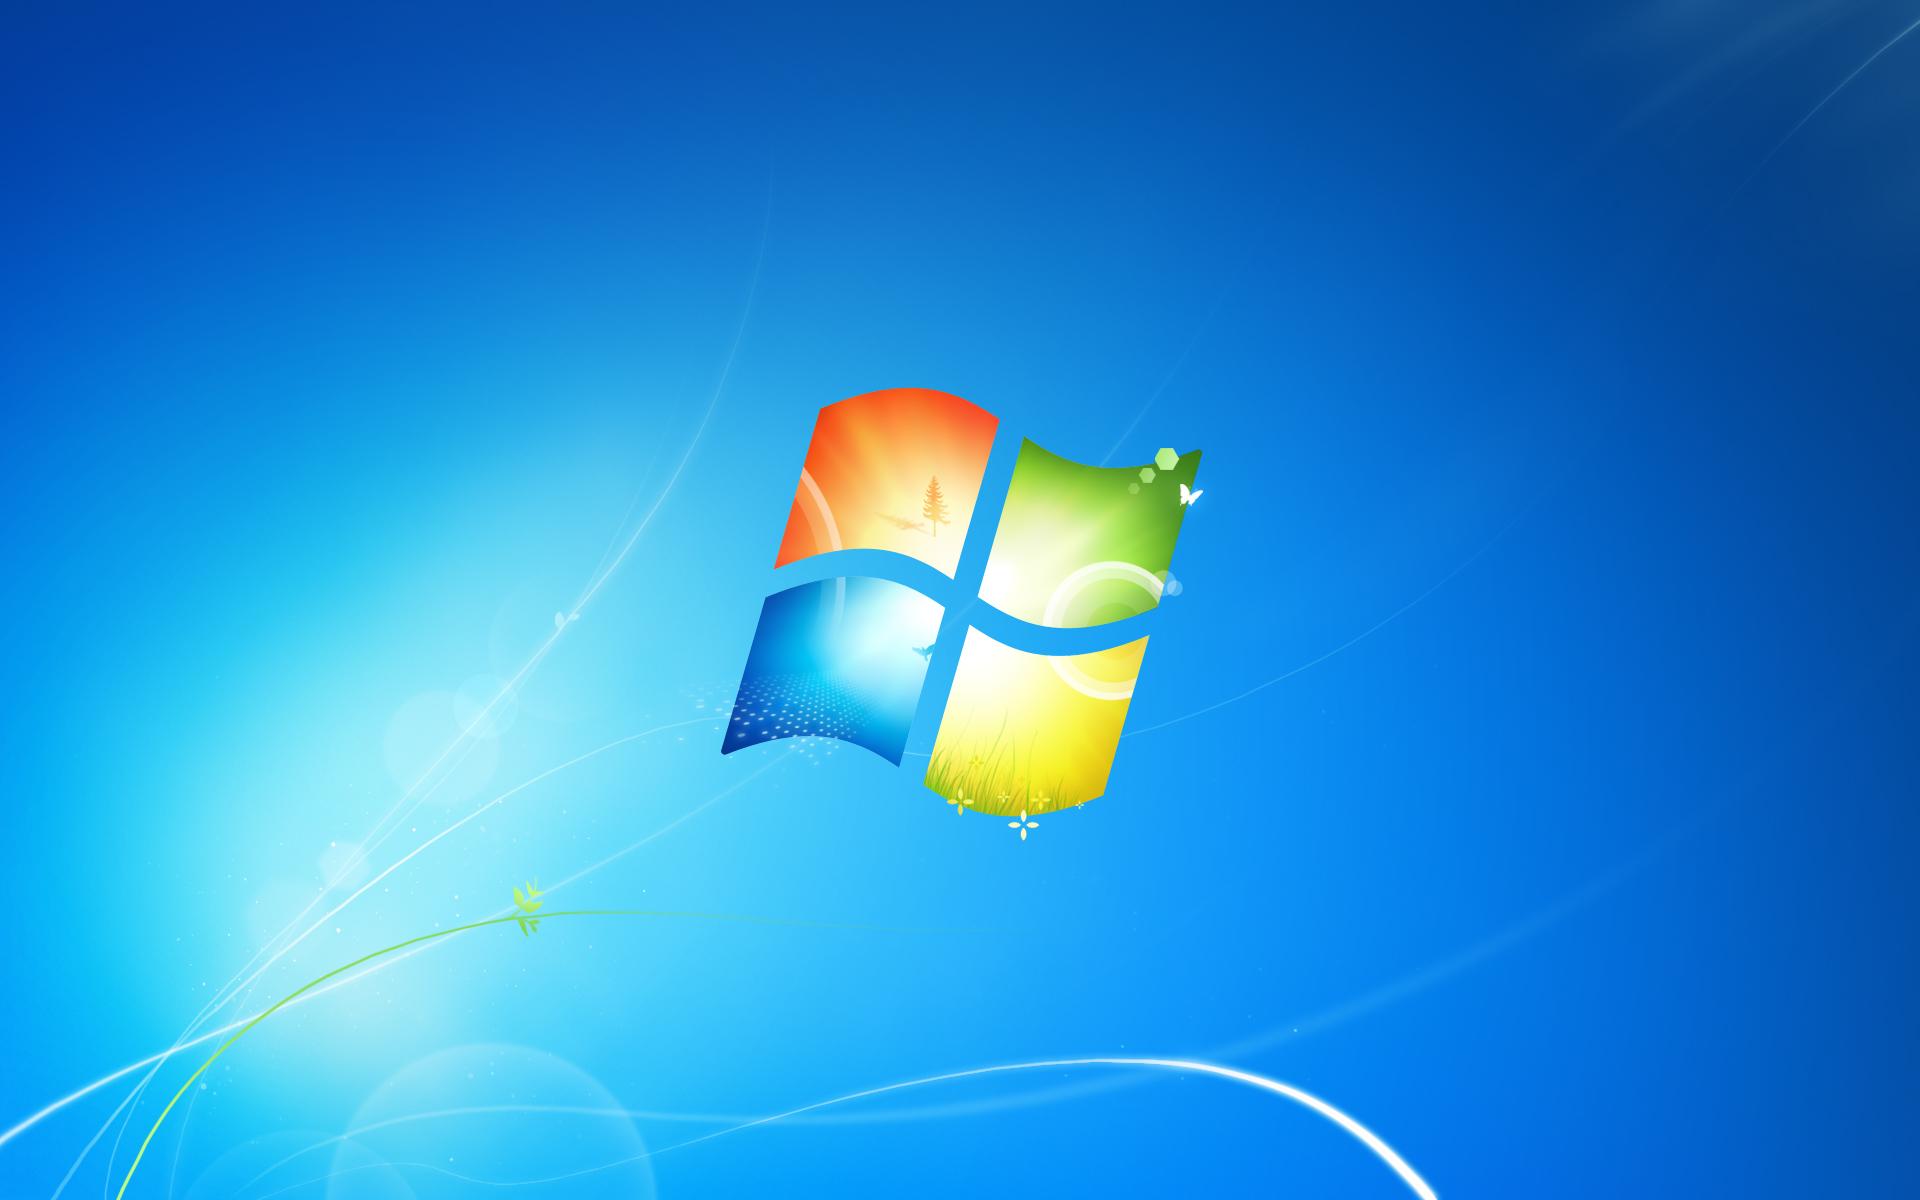 Wallpaper Windows Windows 7 1920x1200